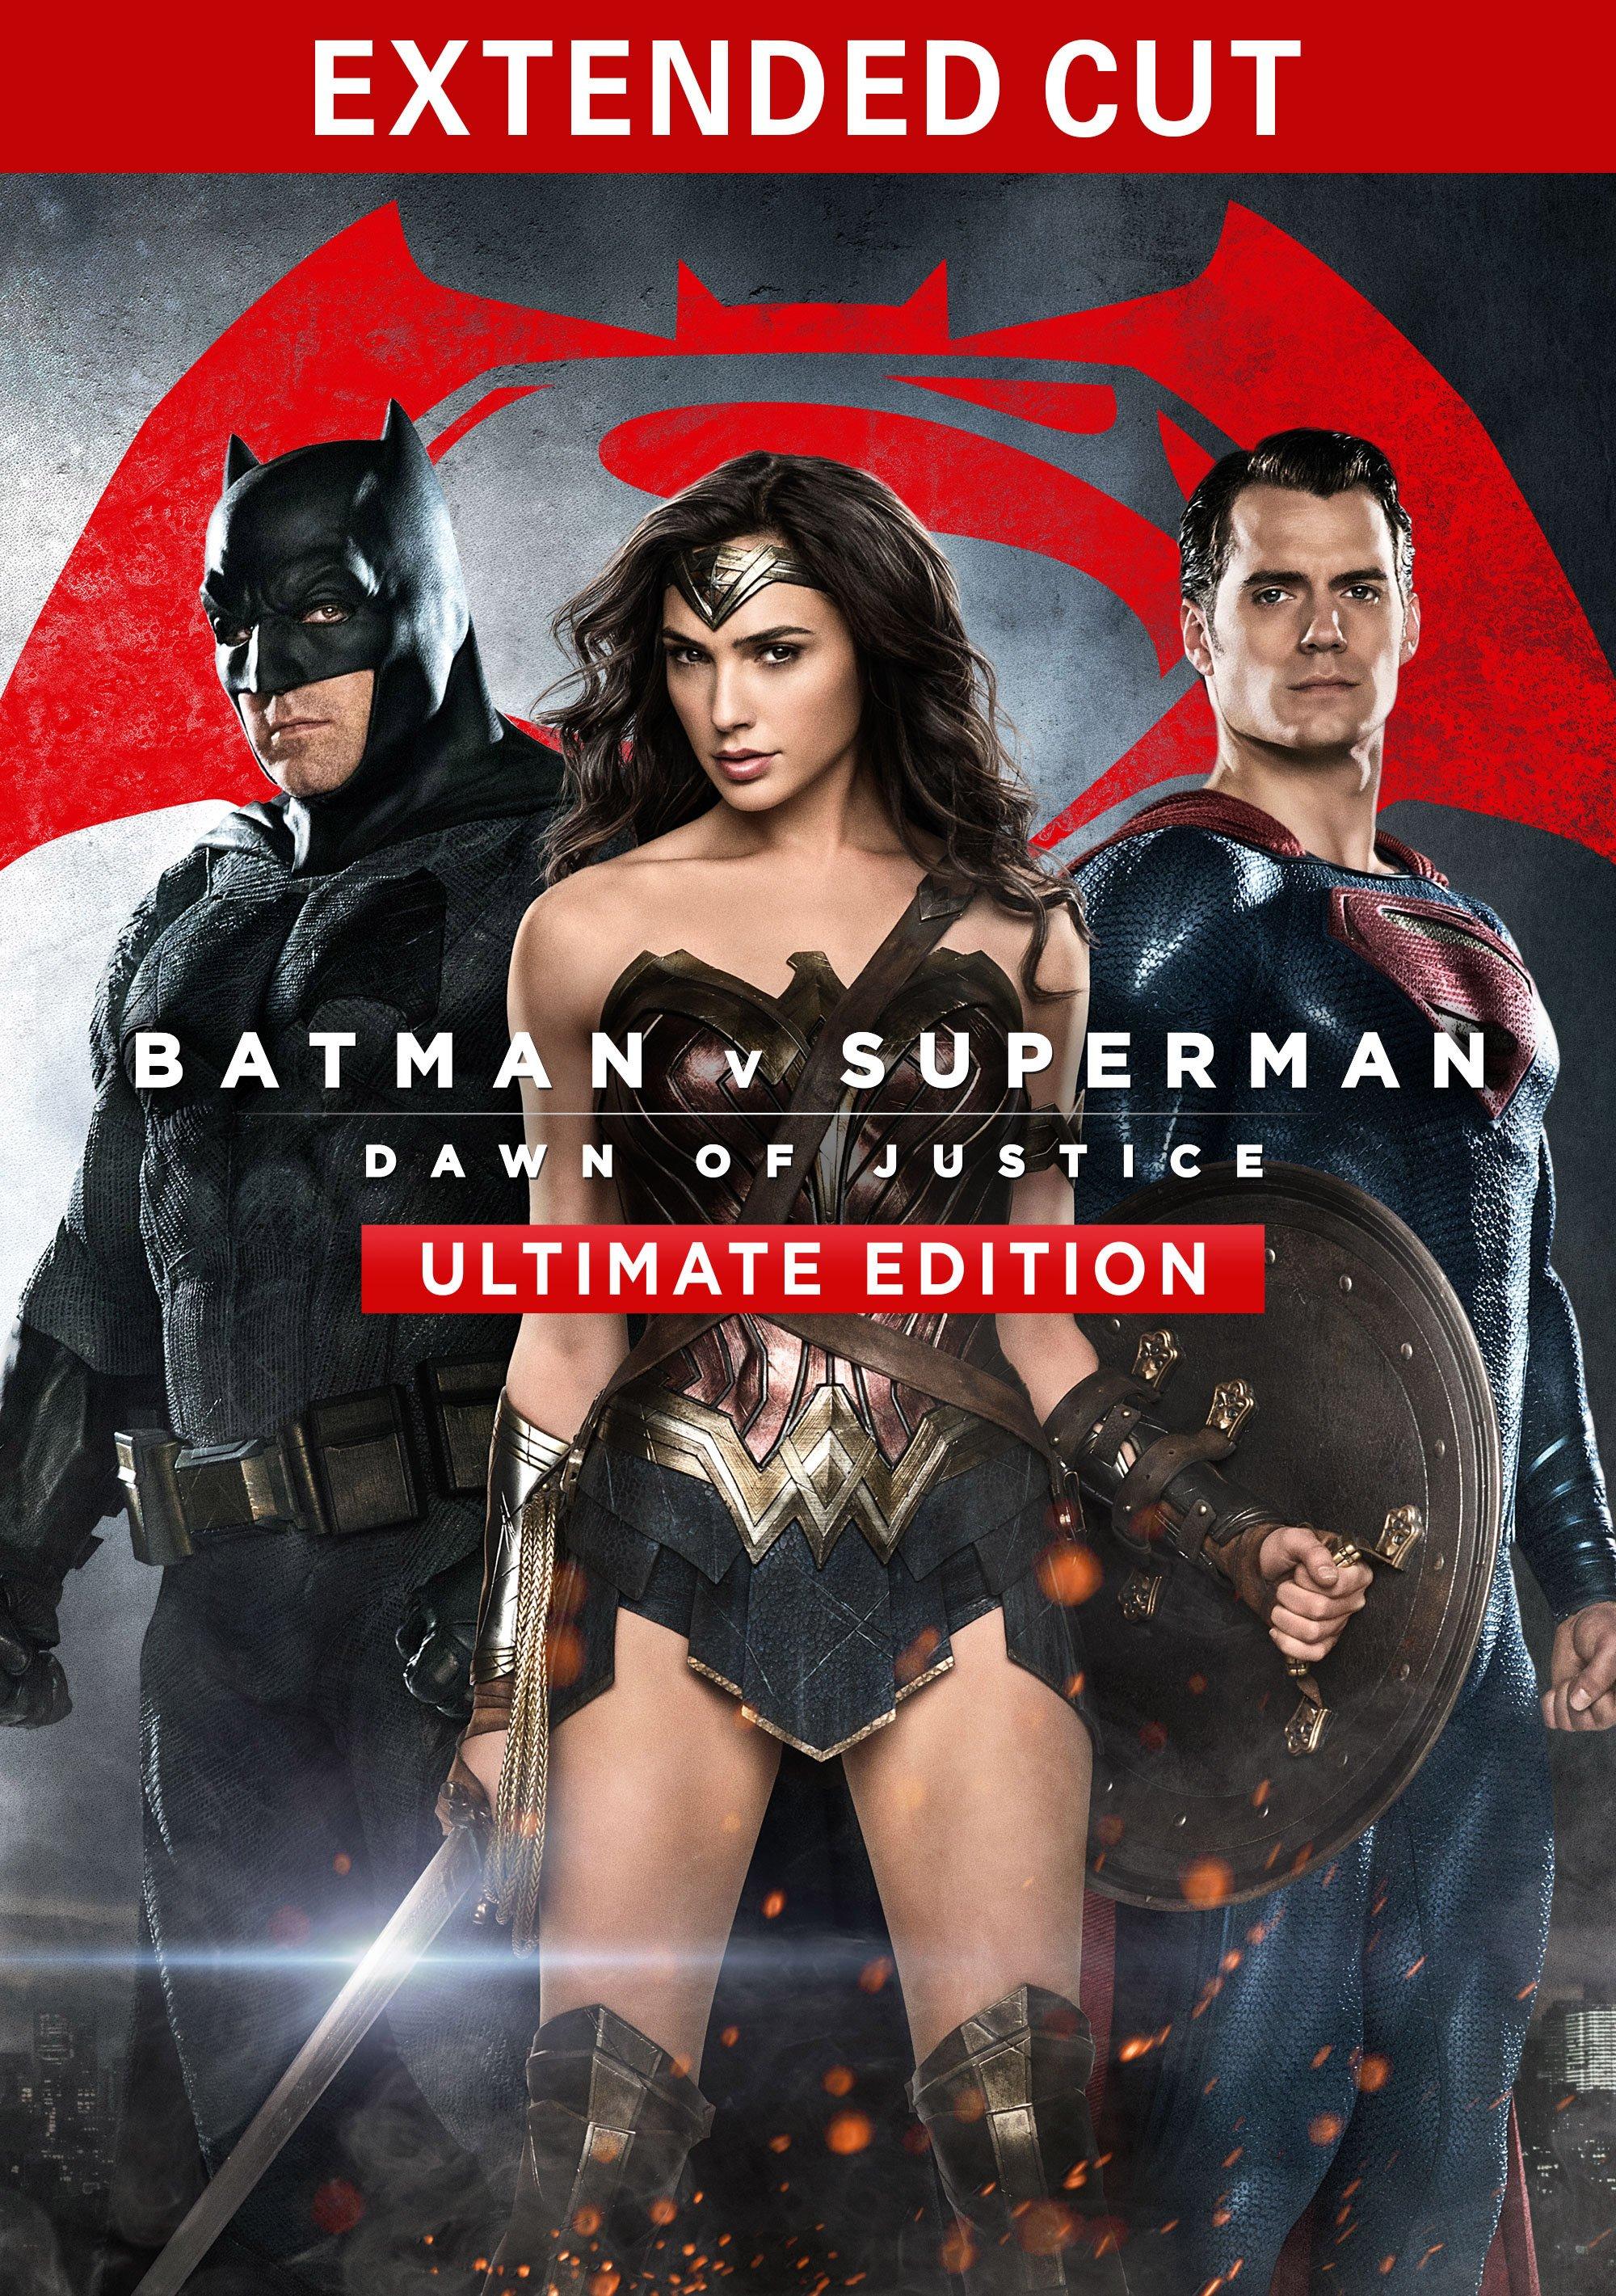 Batman v Superman : Dawn of Justice Ultimate Edition